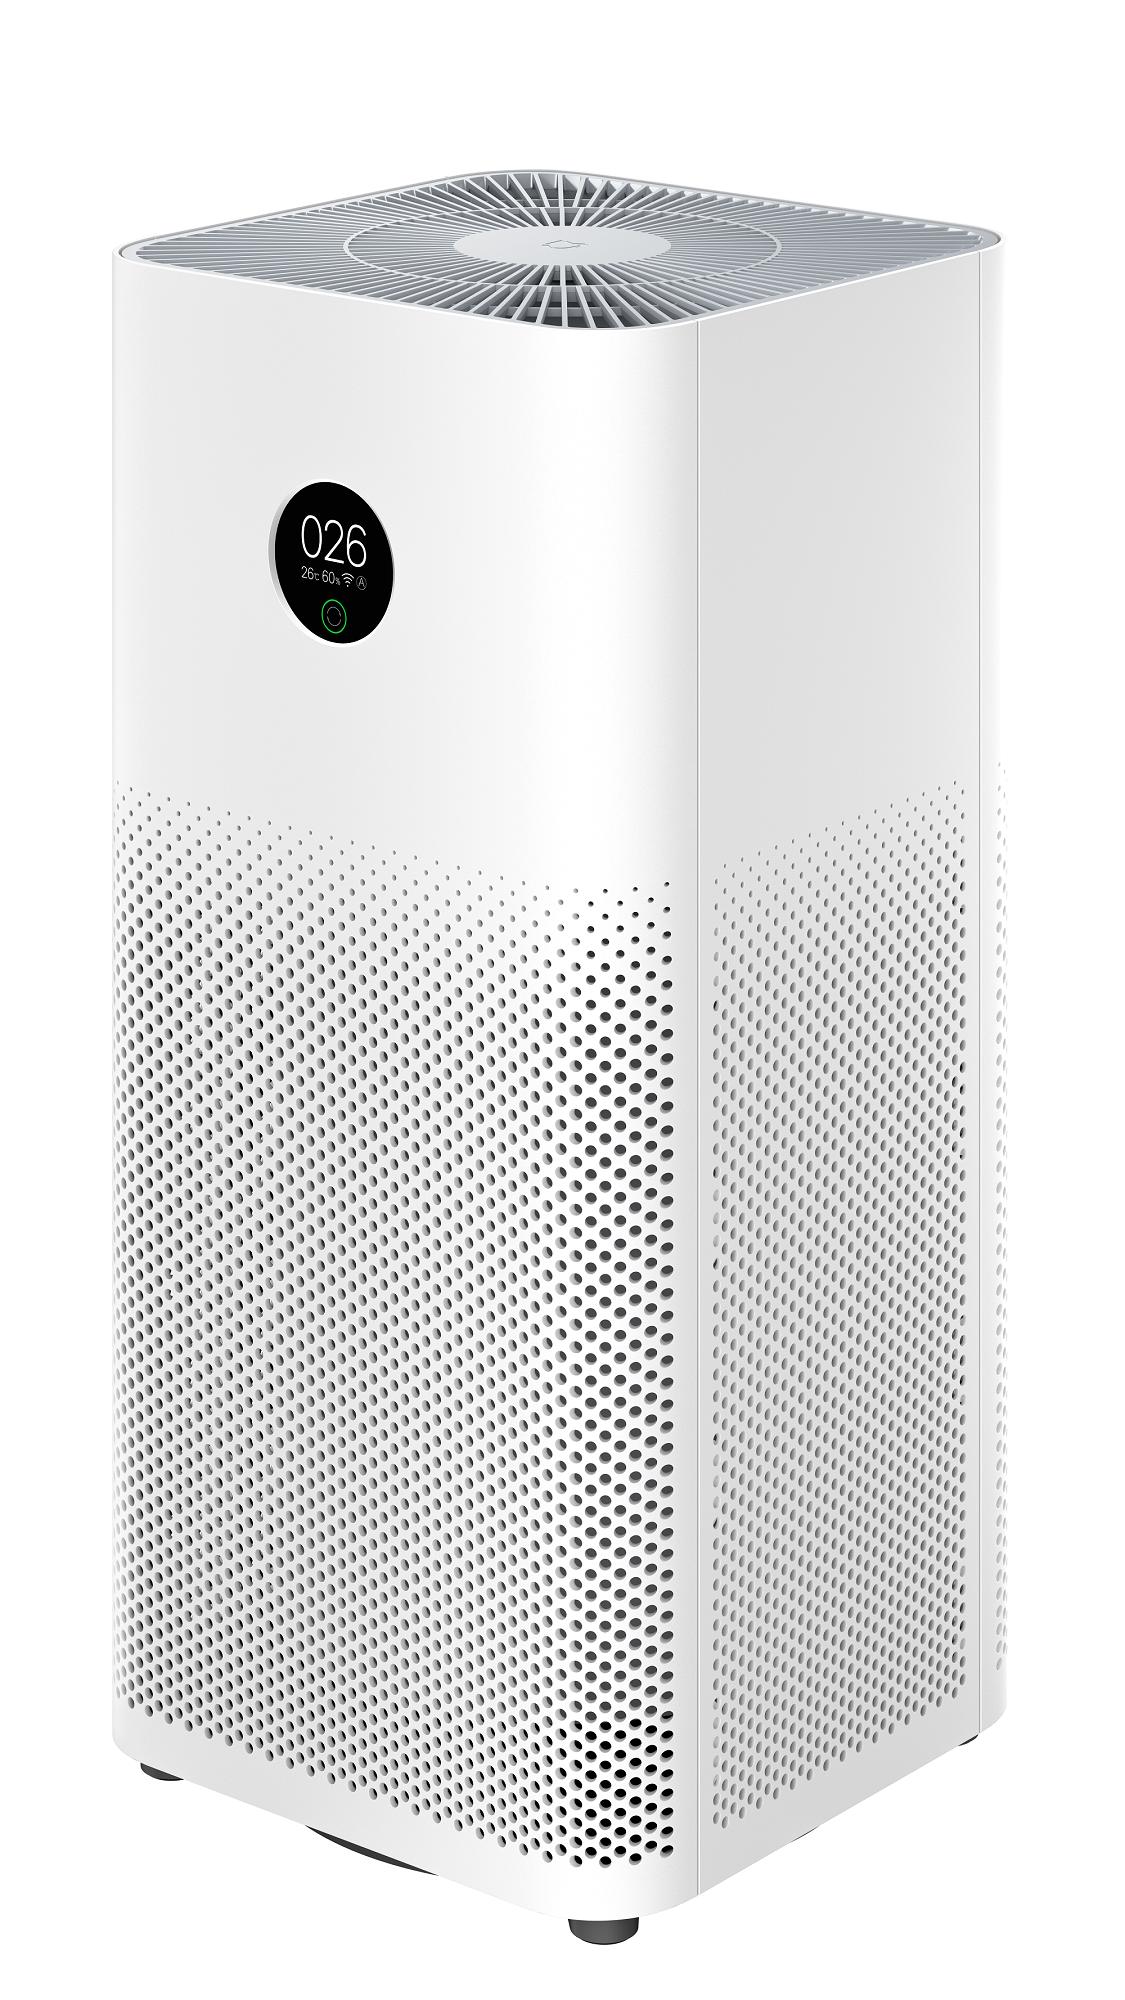 Xiaomi Mi Air Purifier 3H เครื่องฟอกอากาศ ของแท้ ประกันศูนย์ไทย 1ปี